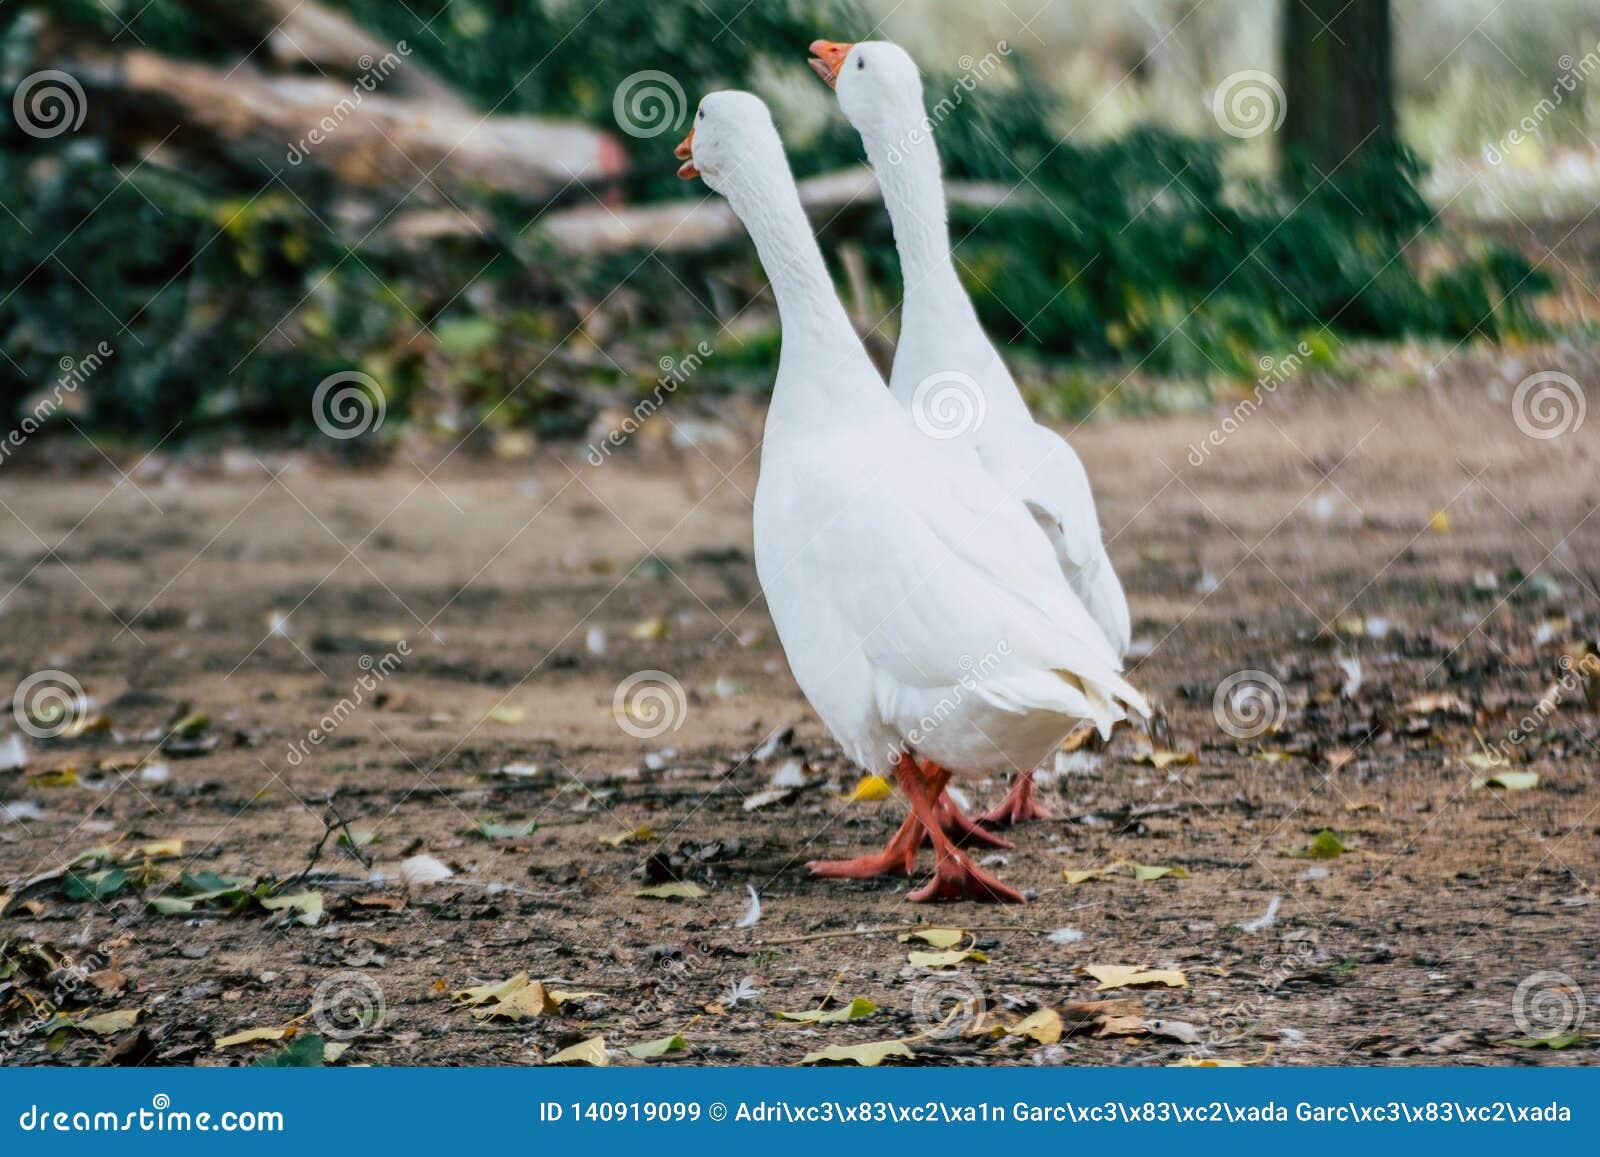 Acople dos gansos dos patos que andam no parque